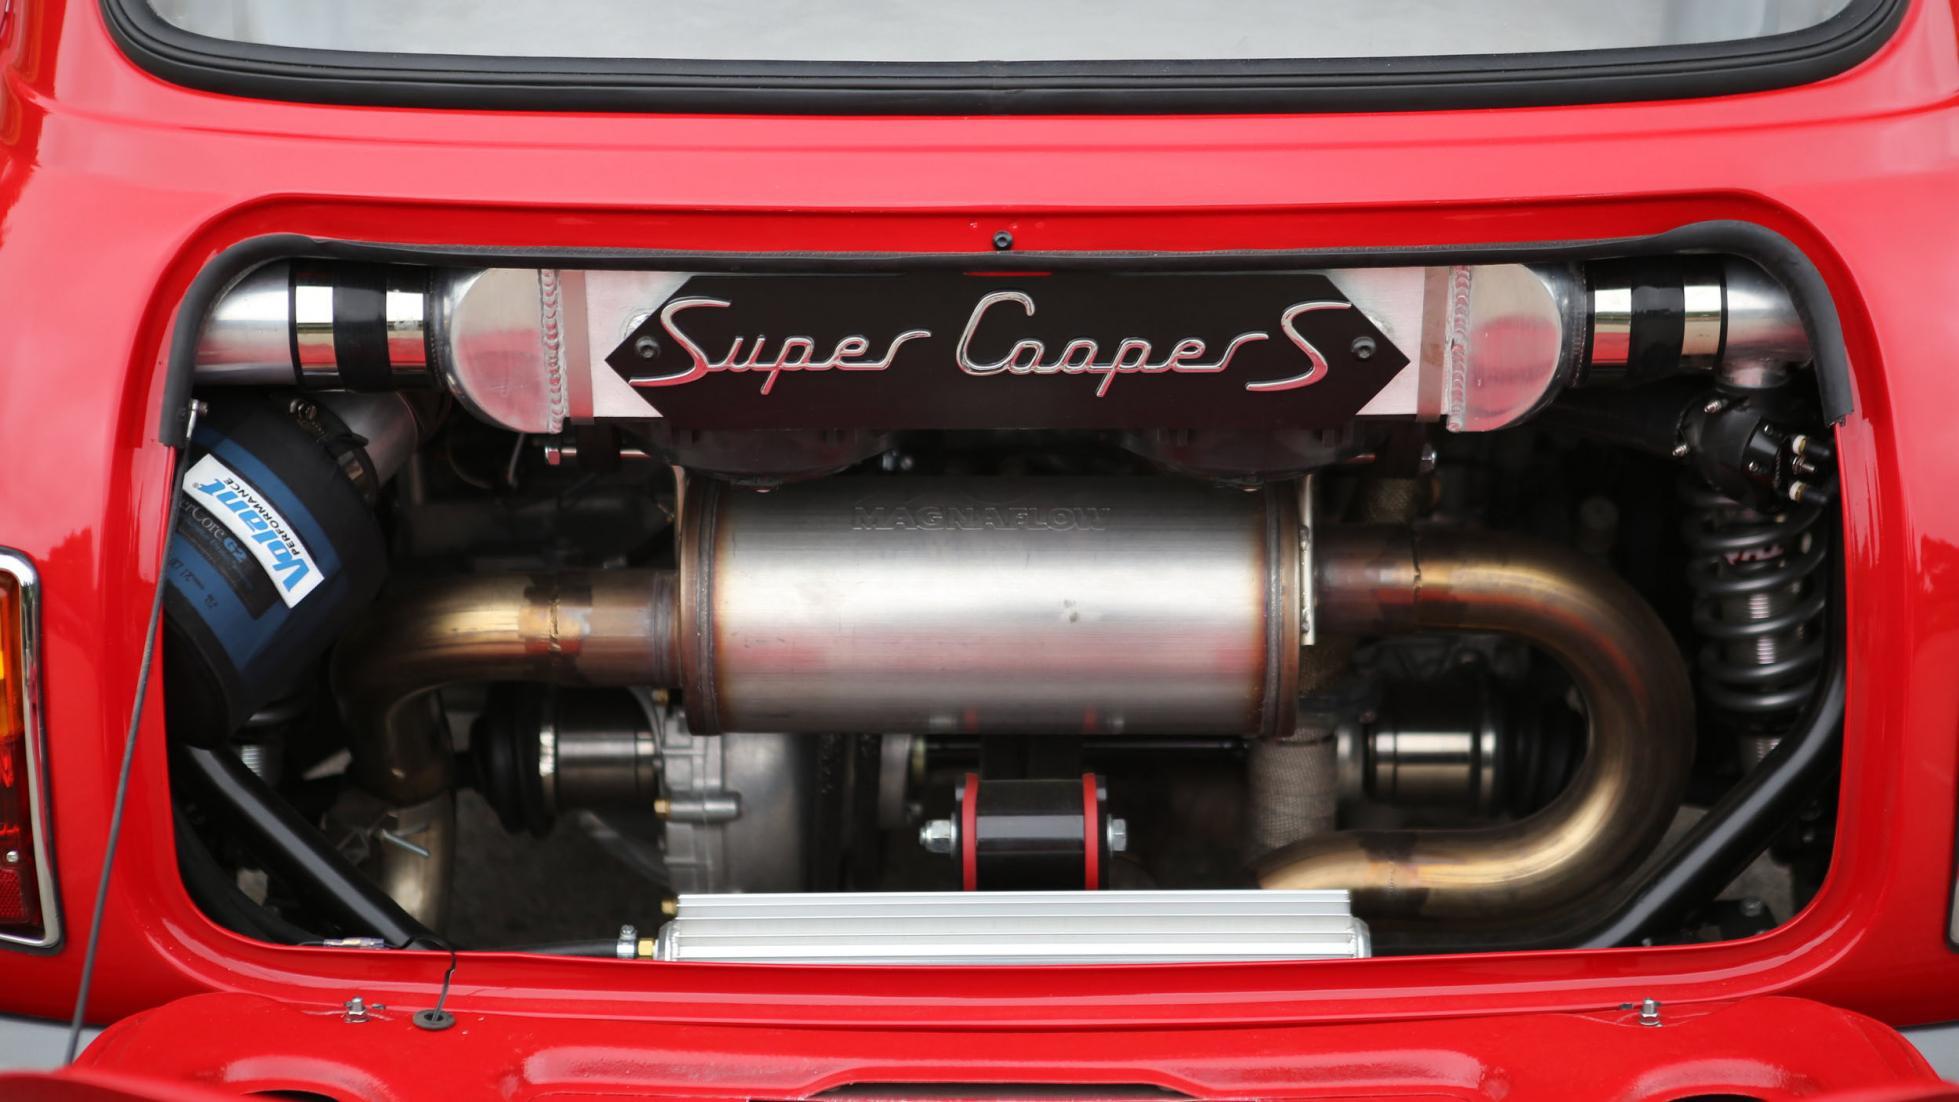 Mini_Super_Cooper_0003